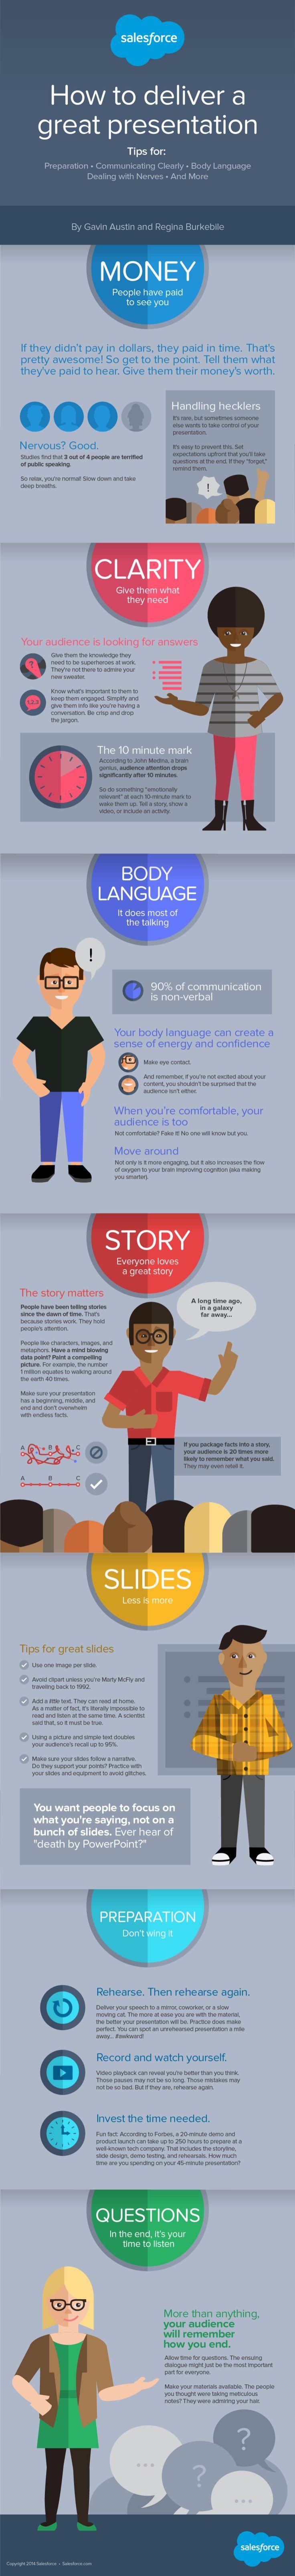 Communication Tips ... How to Deliver a Great Presentation #entrepreneurs #publicspeaking www.OneMorePress.com